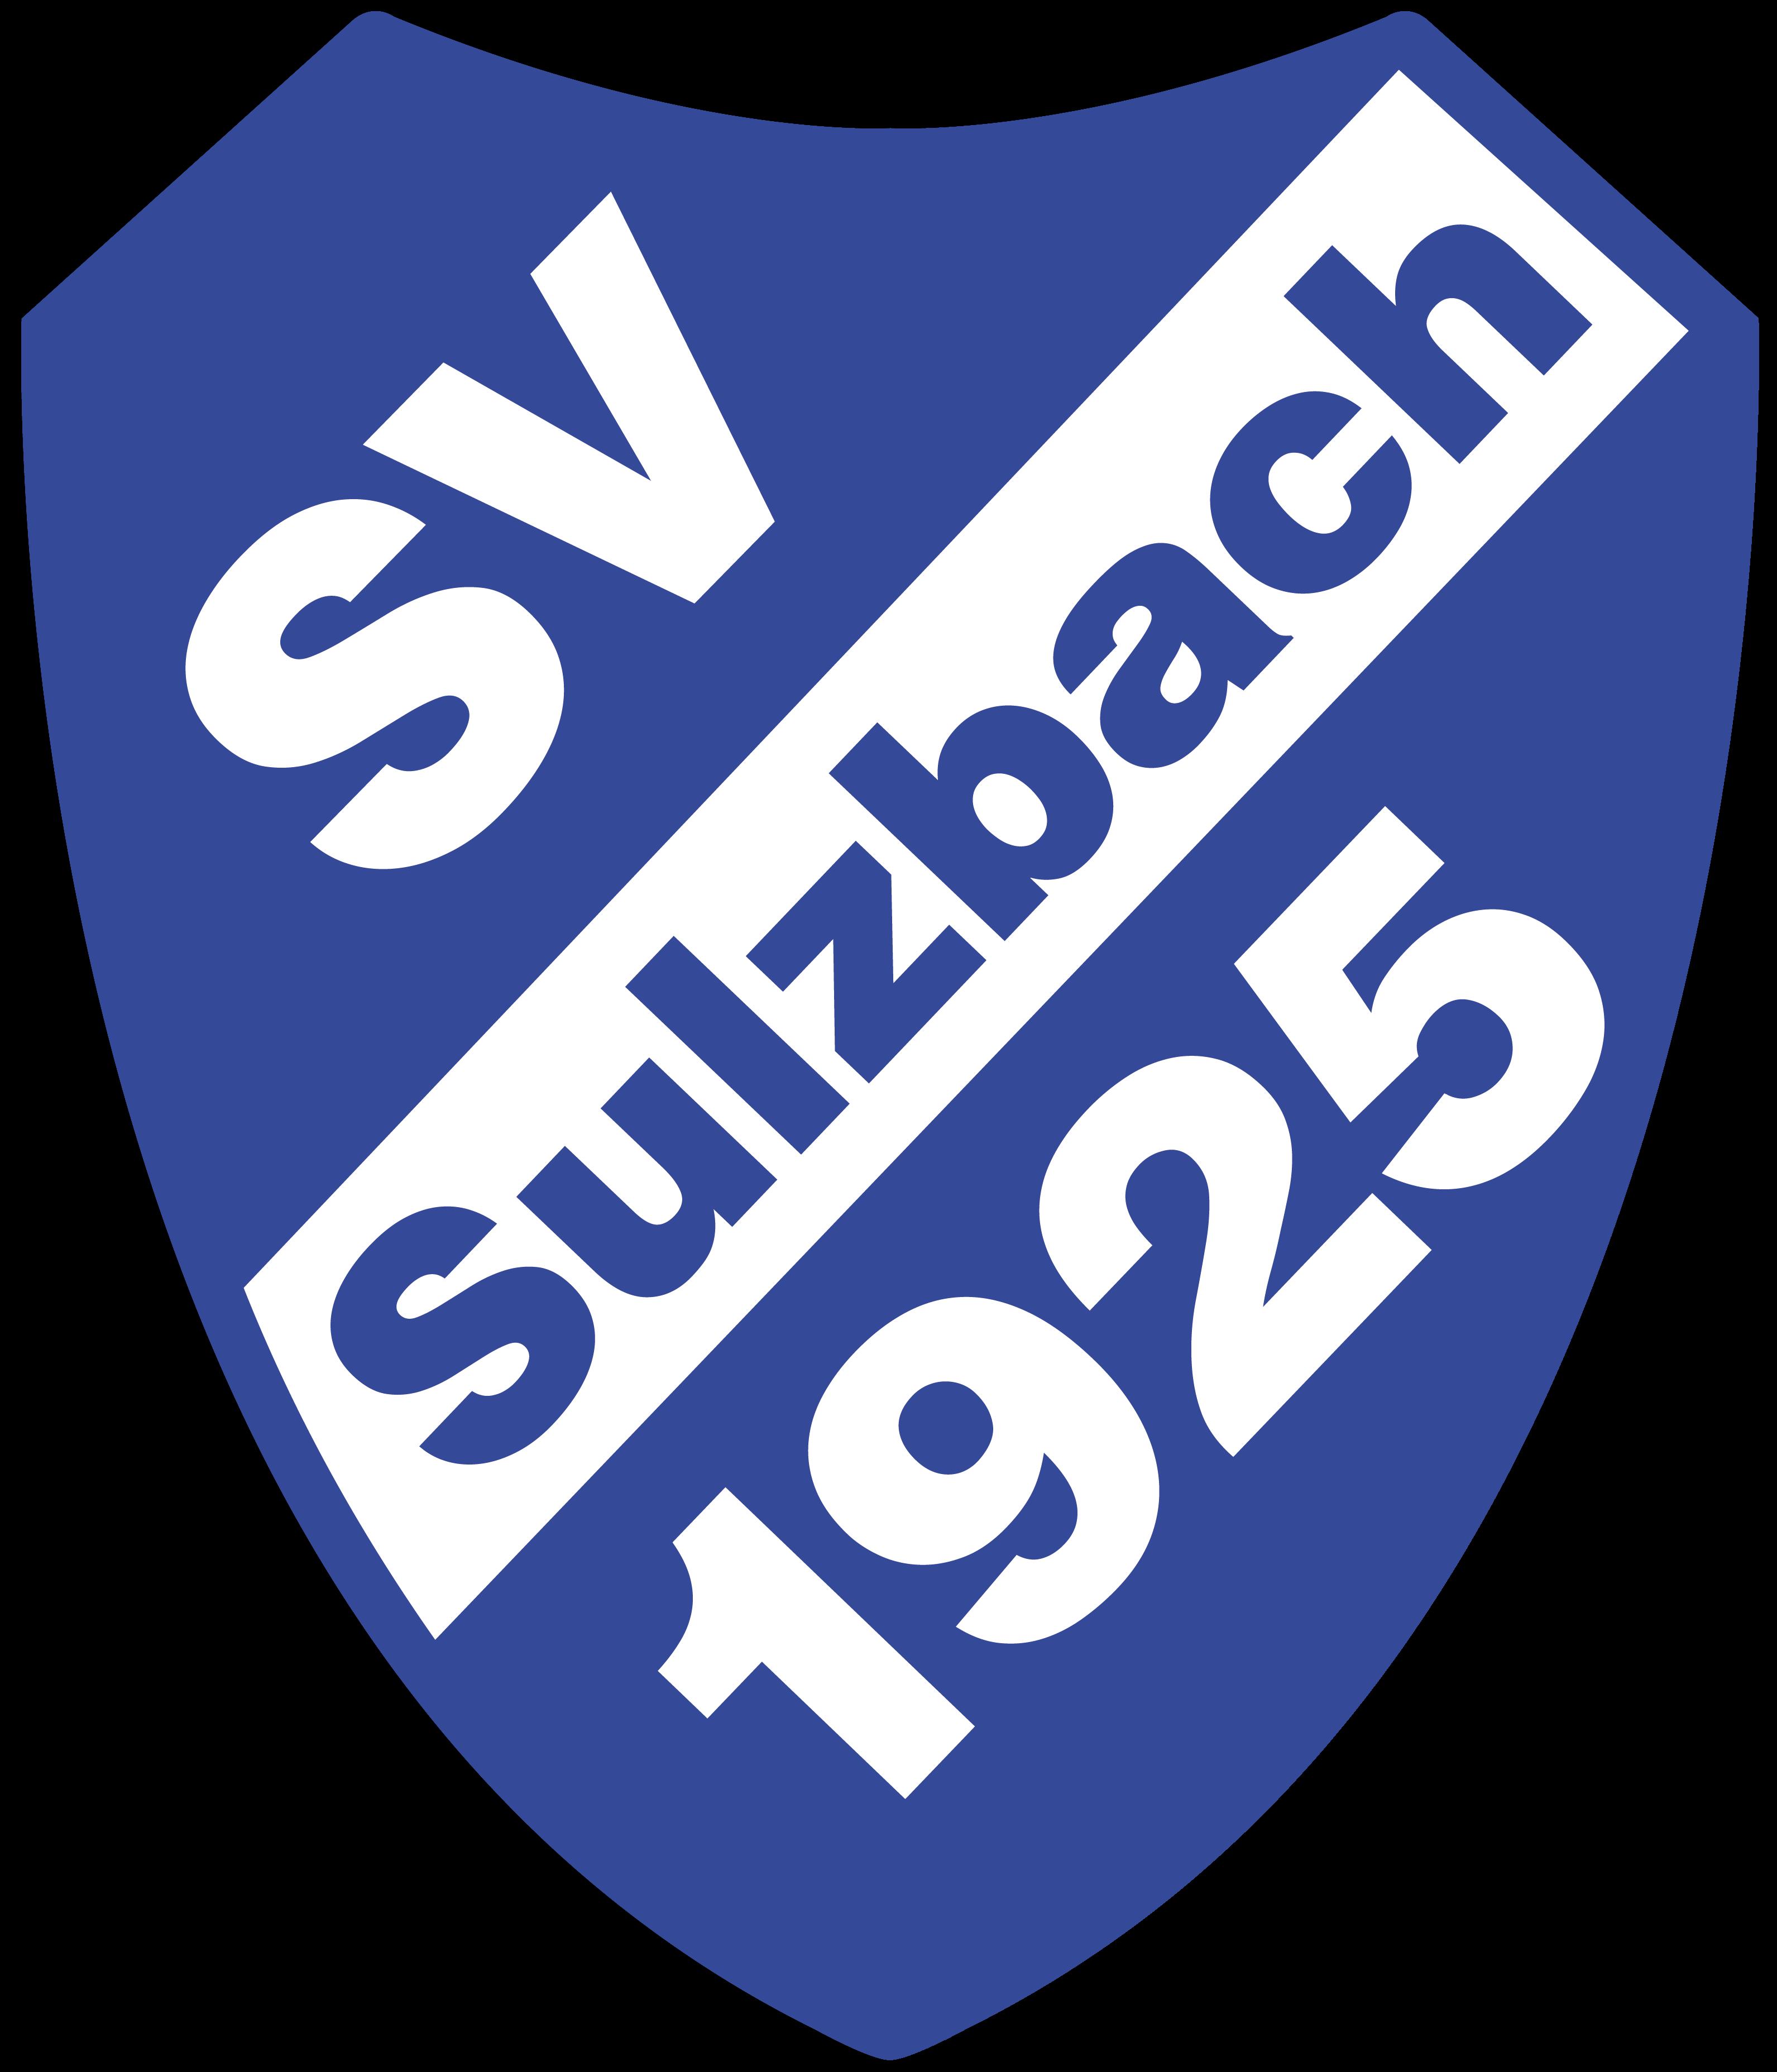 SV 1925 Sulzbach e.V.